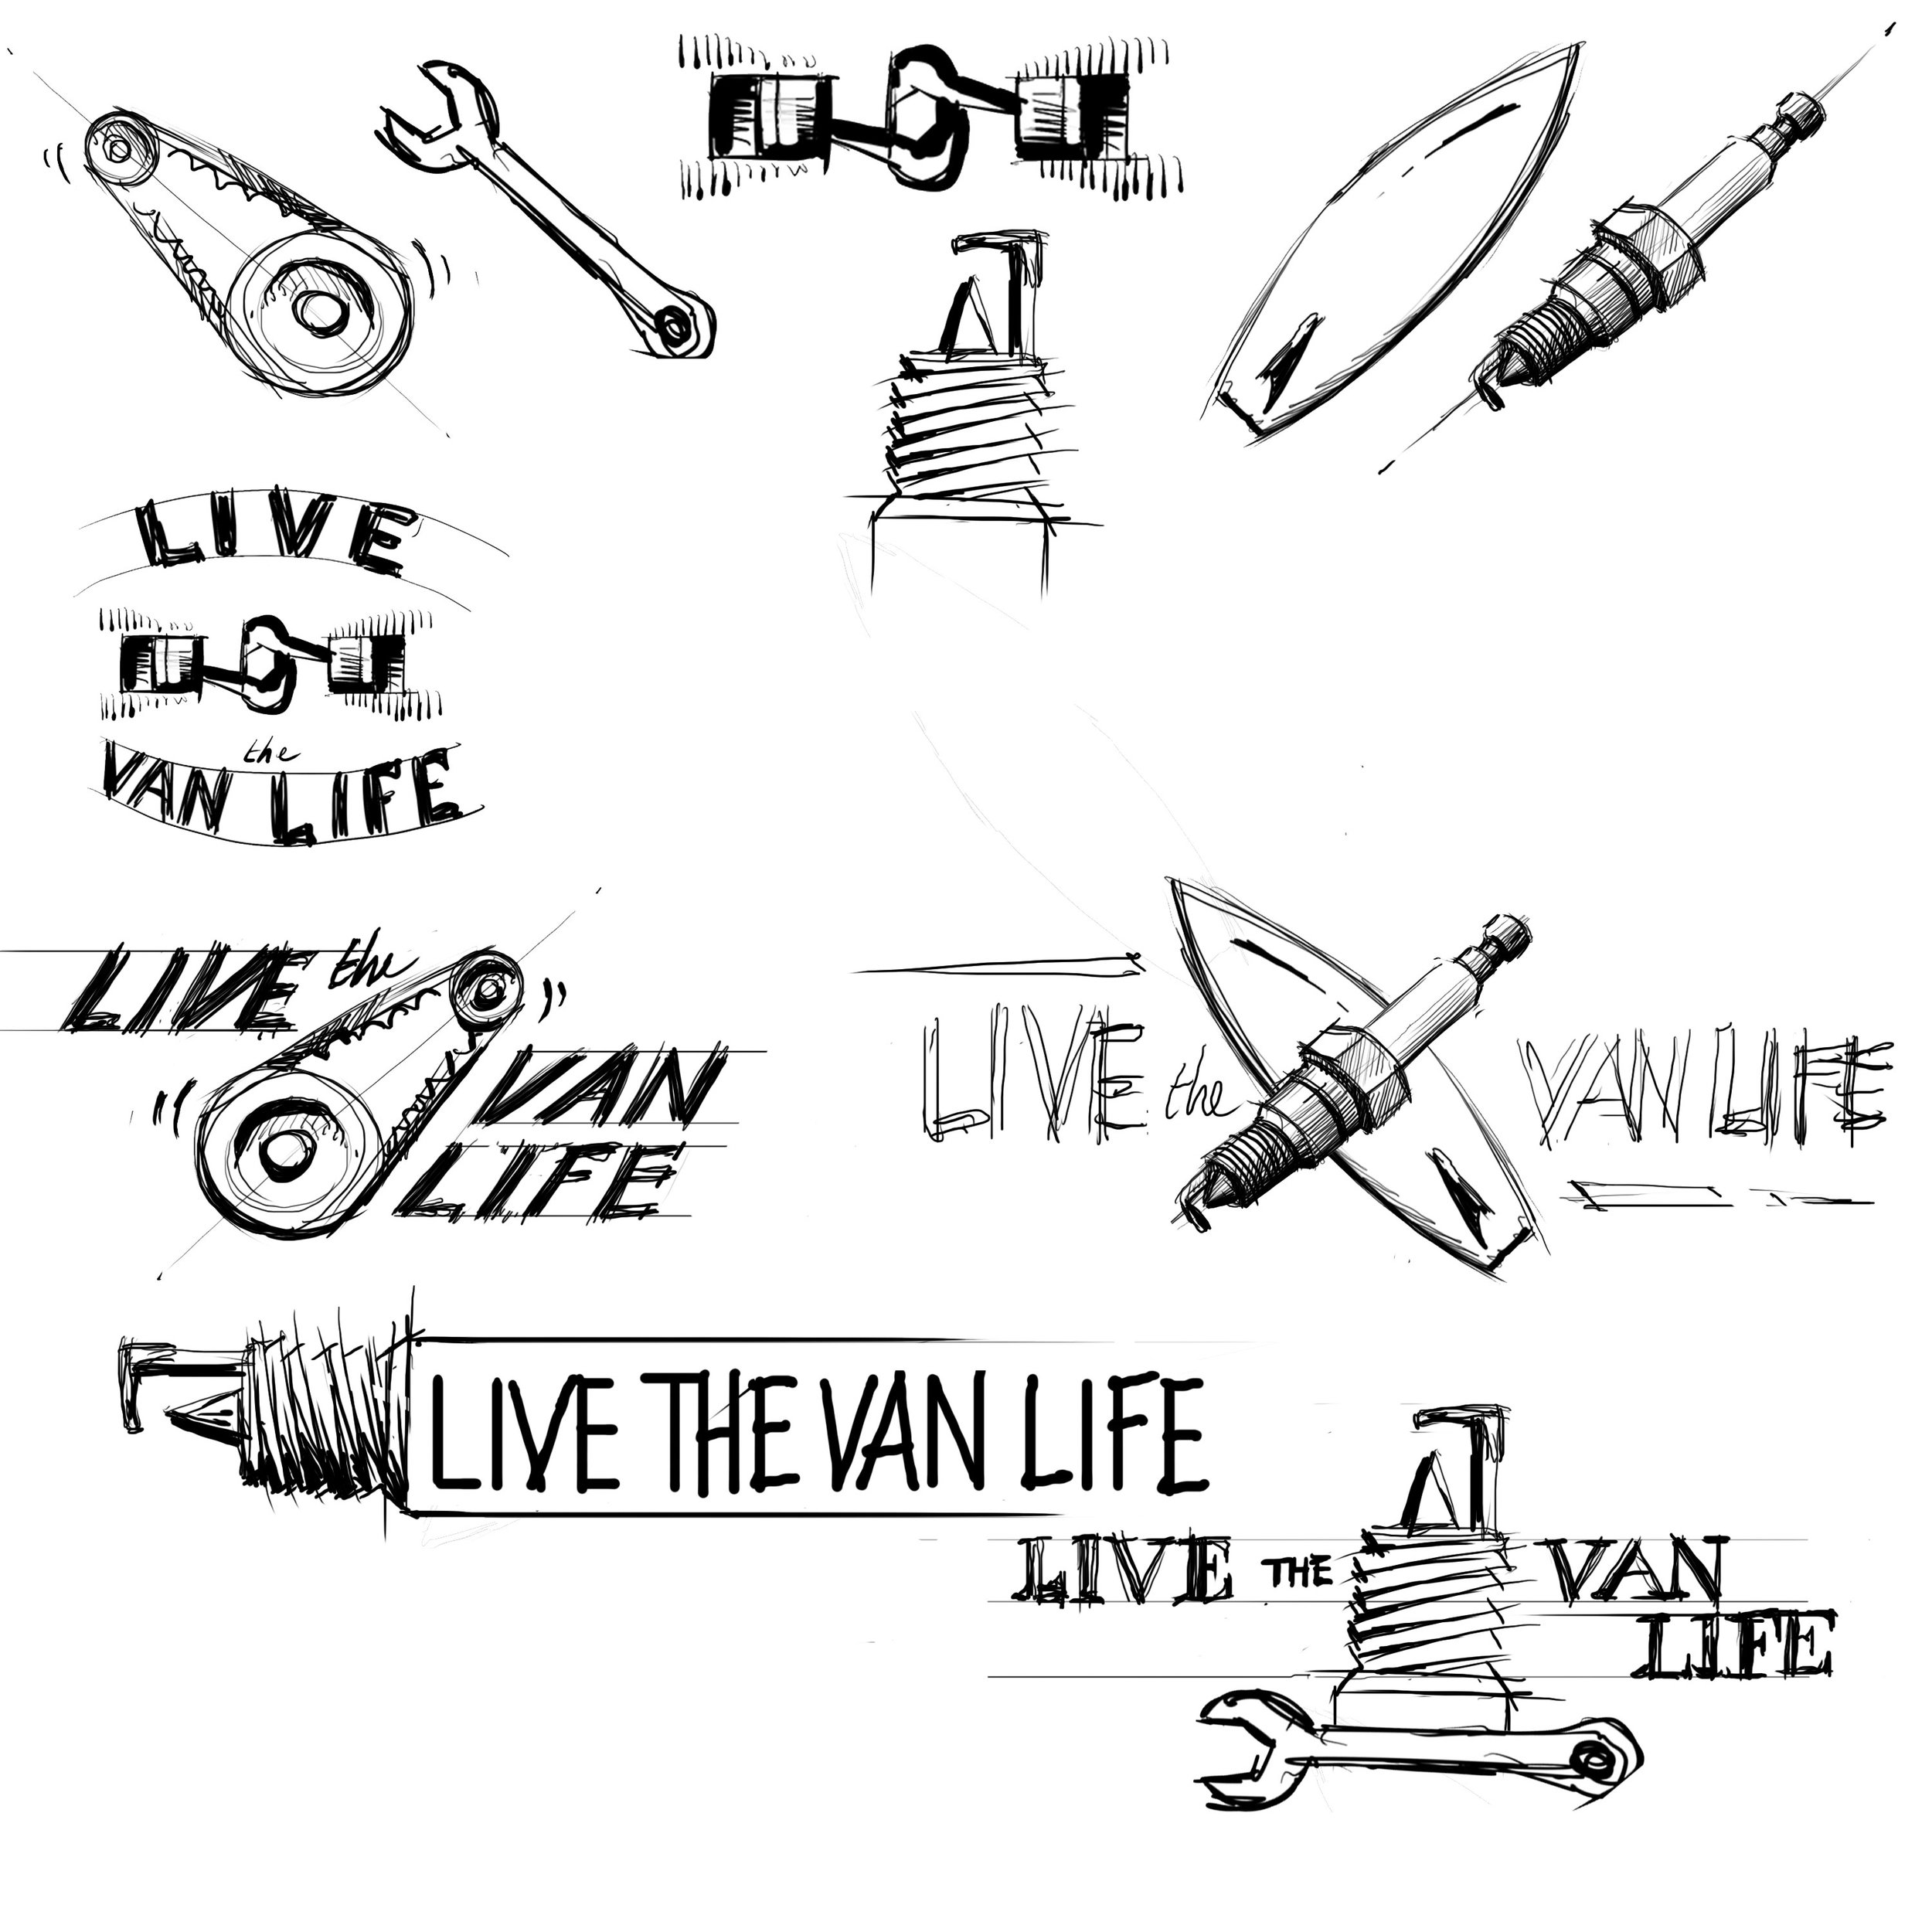 live-the-van-life-logo-sketches1.jpg